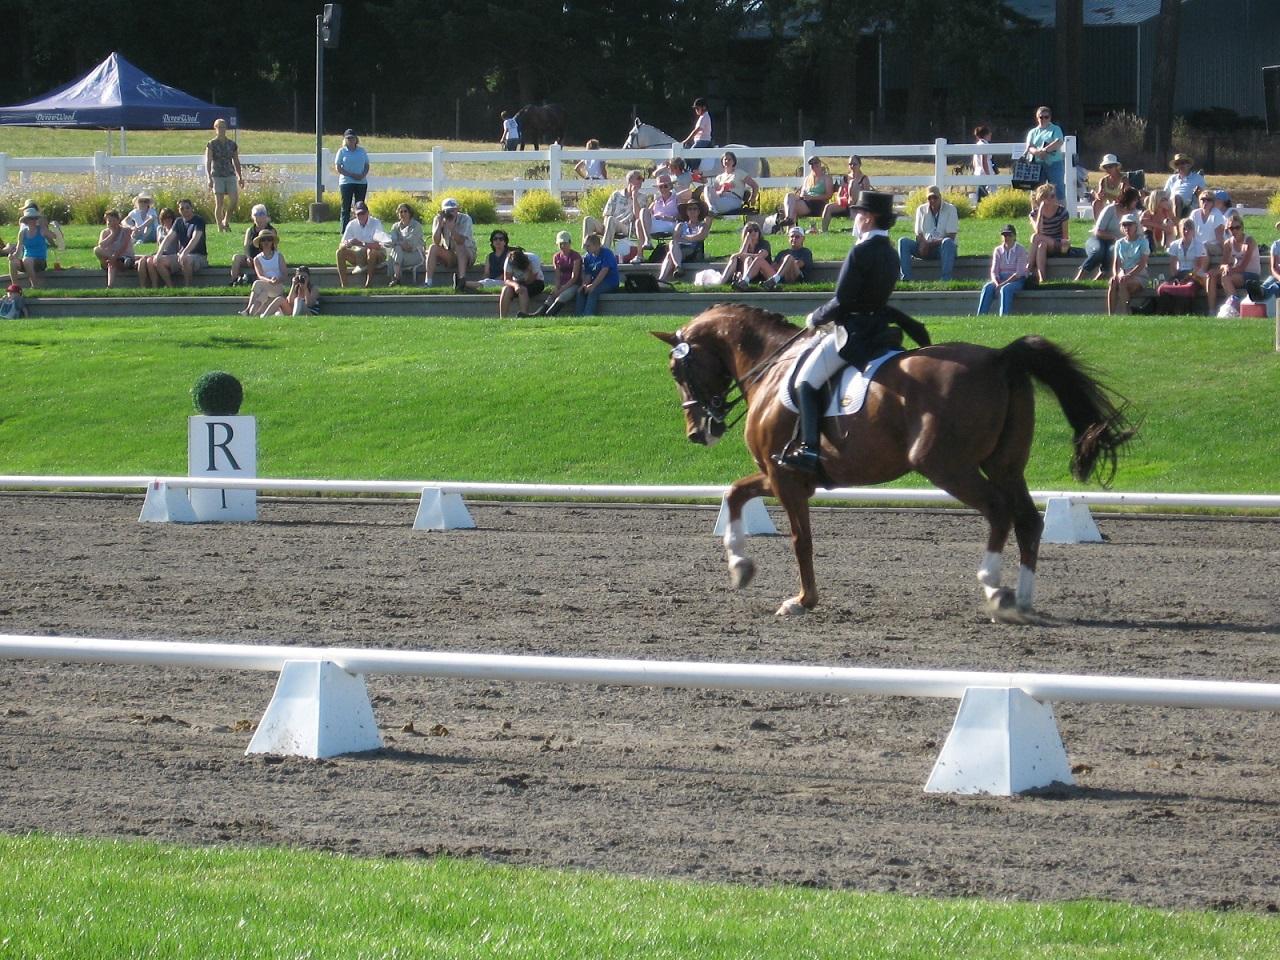 Sport events near Portland